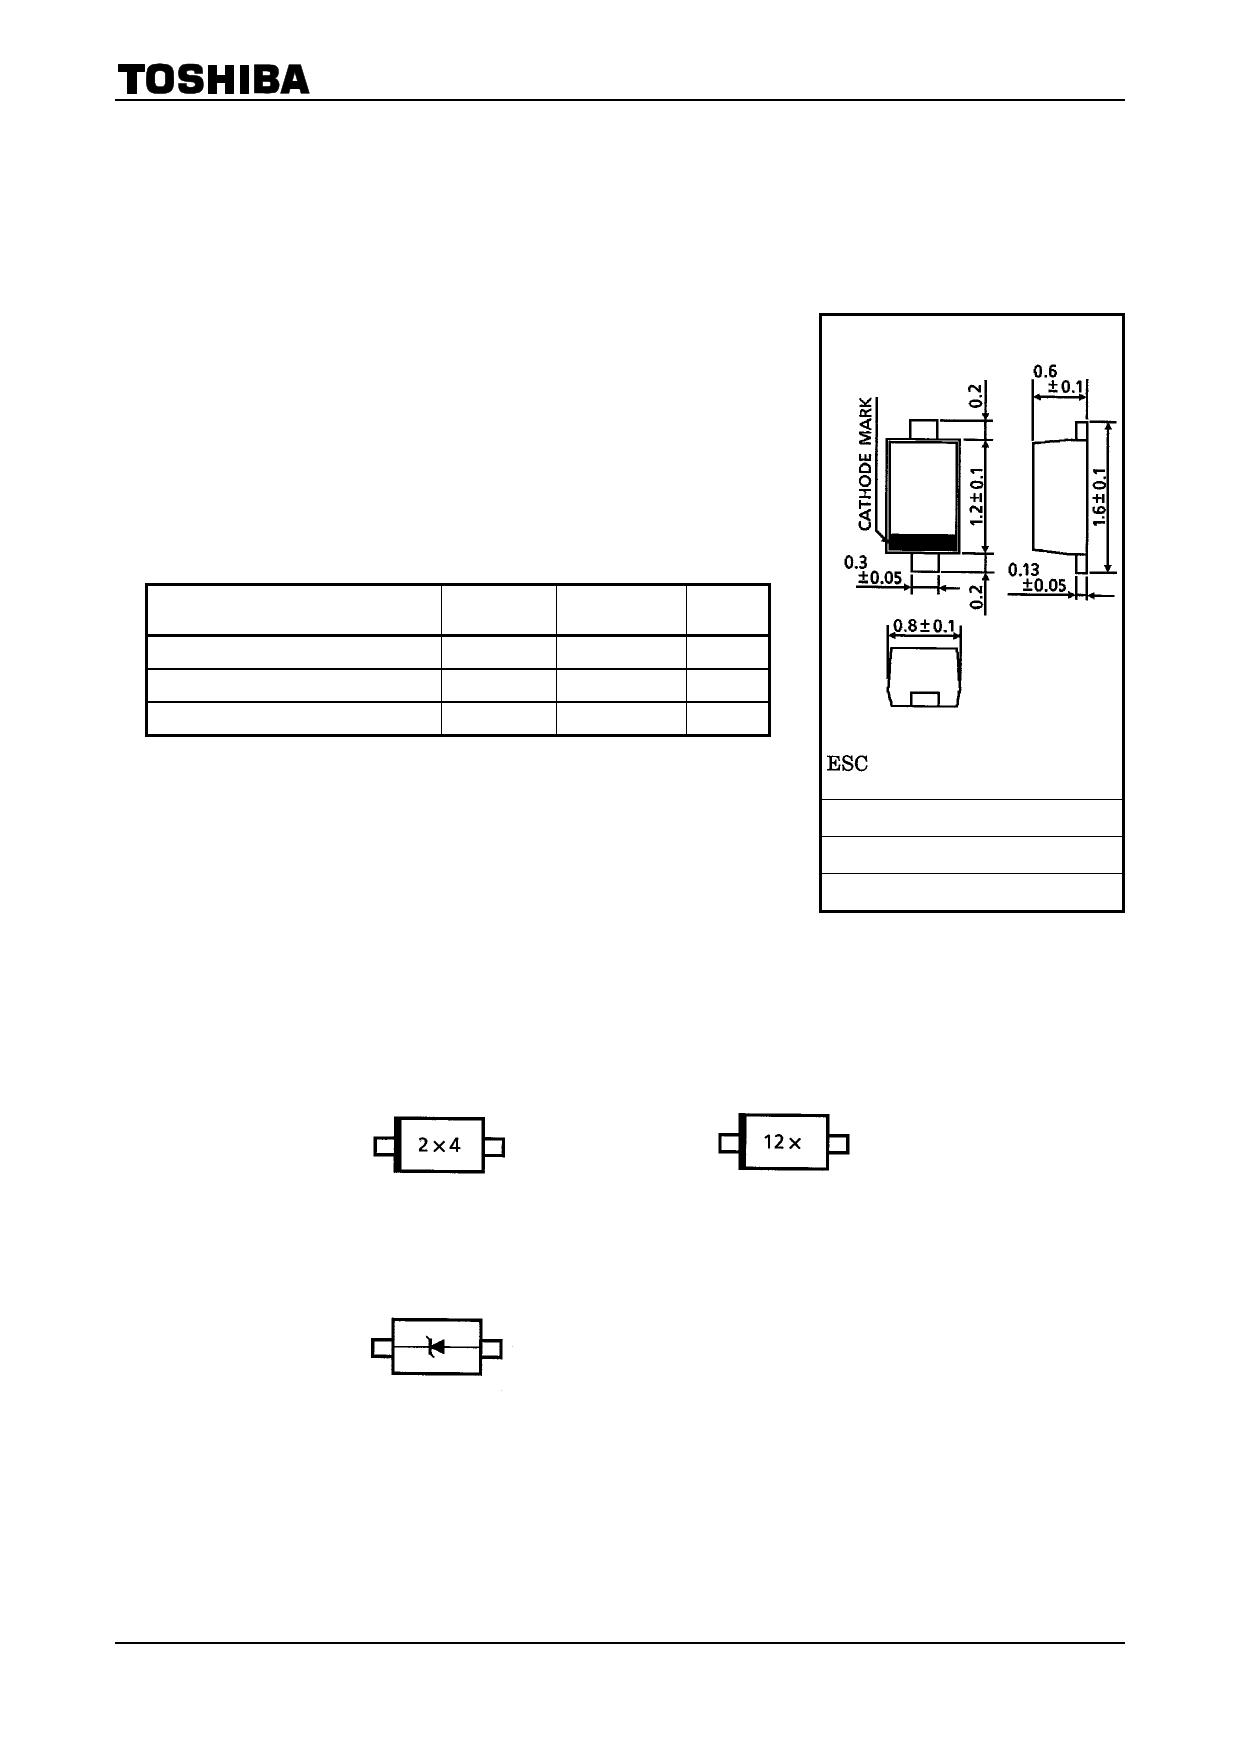 015AZ2.2 datasheet